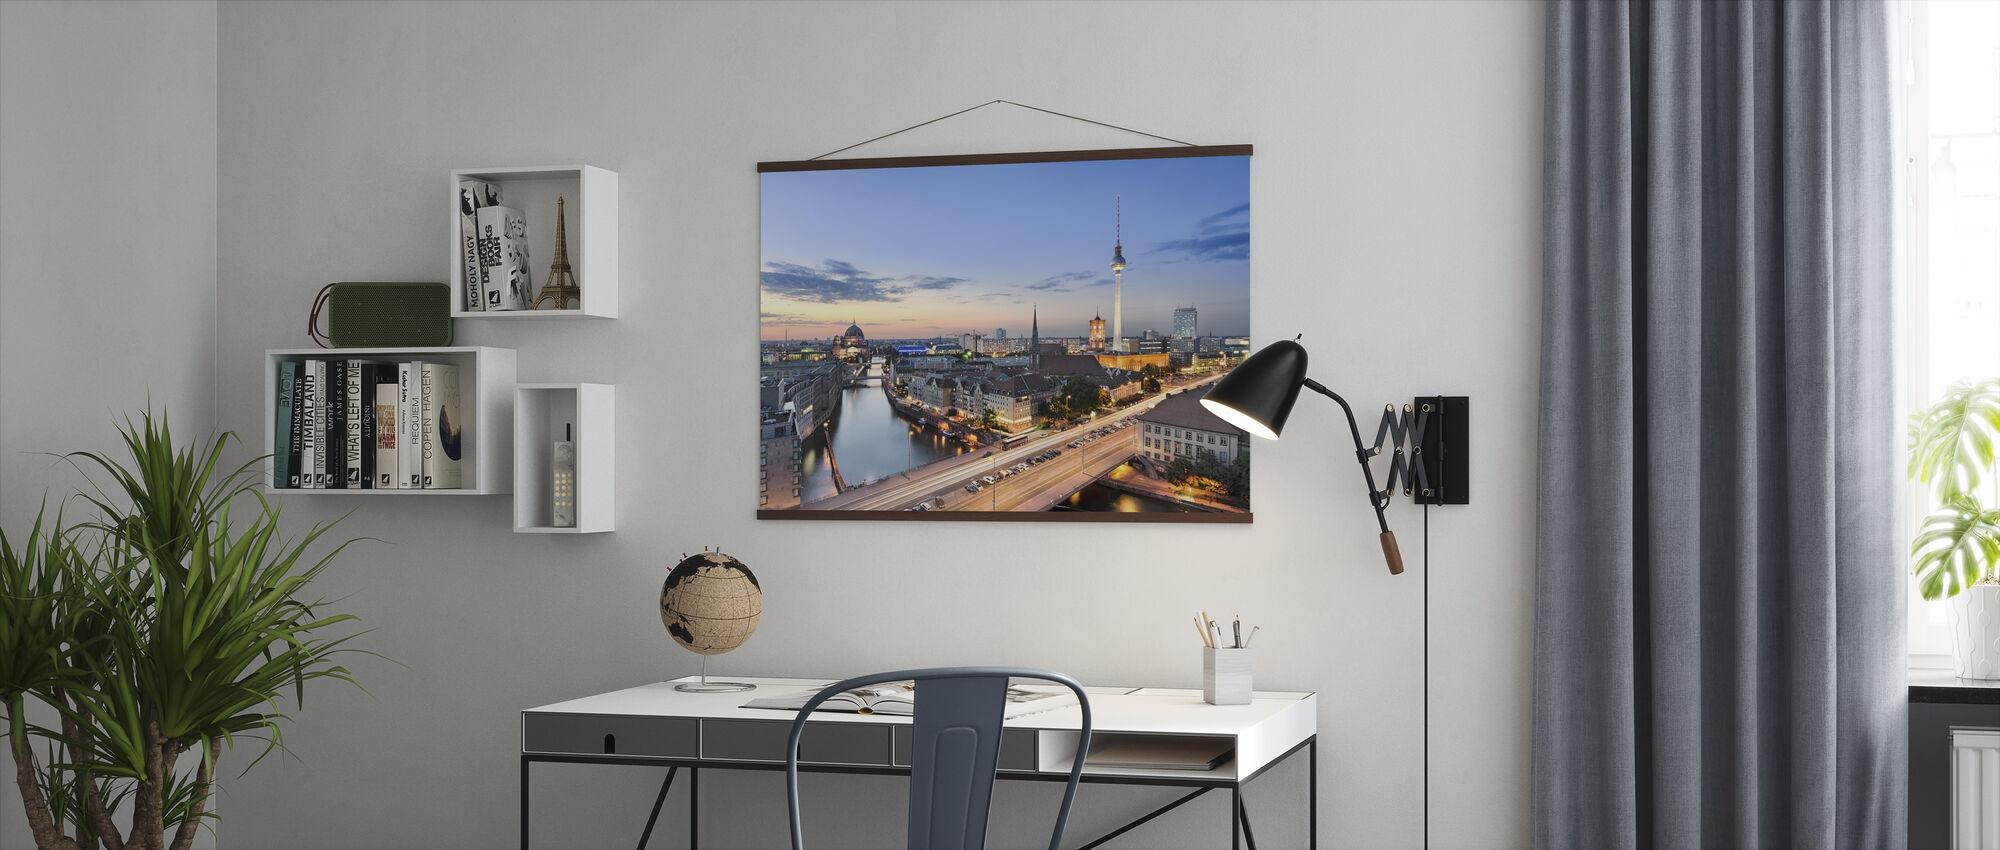 Berlin Skyline Panorama - Poster - Office